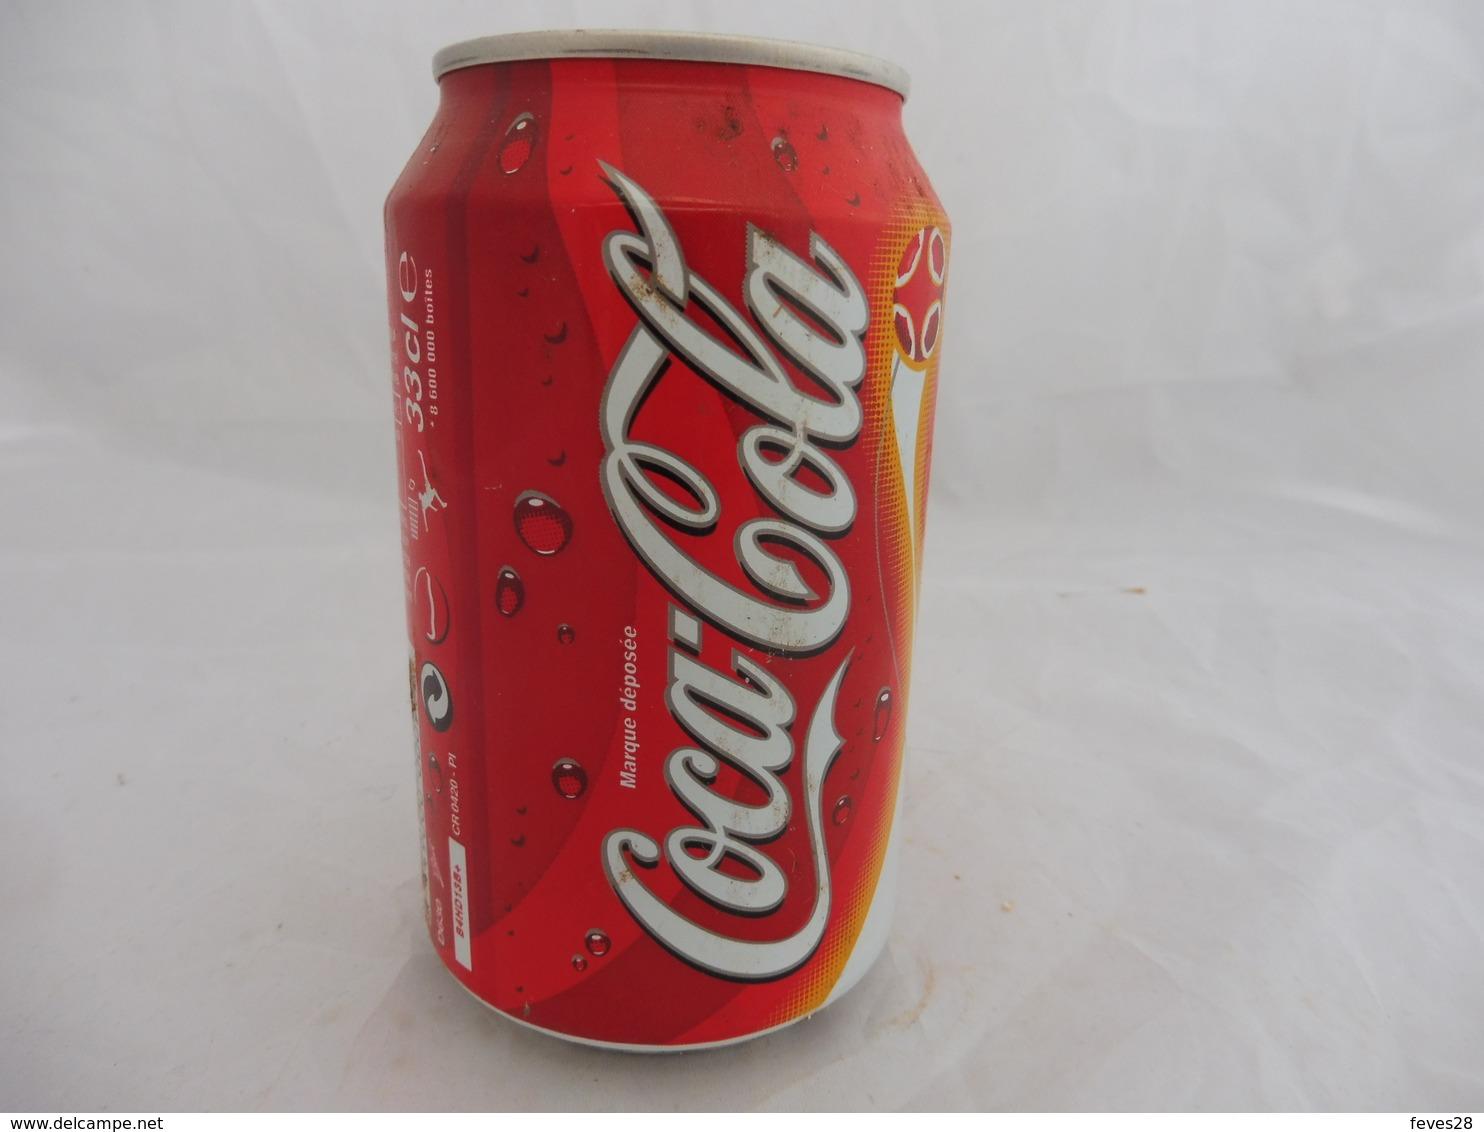 COCA COLA® CANETTE VIDE SERIE LIMITEE N°10/12 ROBERT PIRES 2005 FRANCE 33 Cl - Cannettes